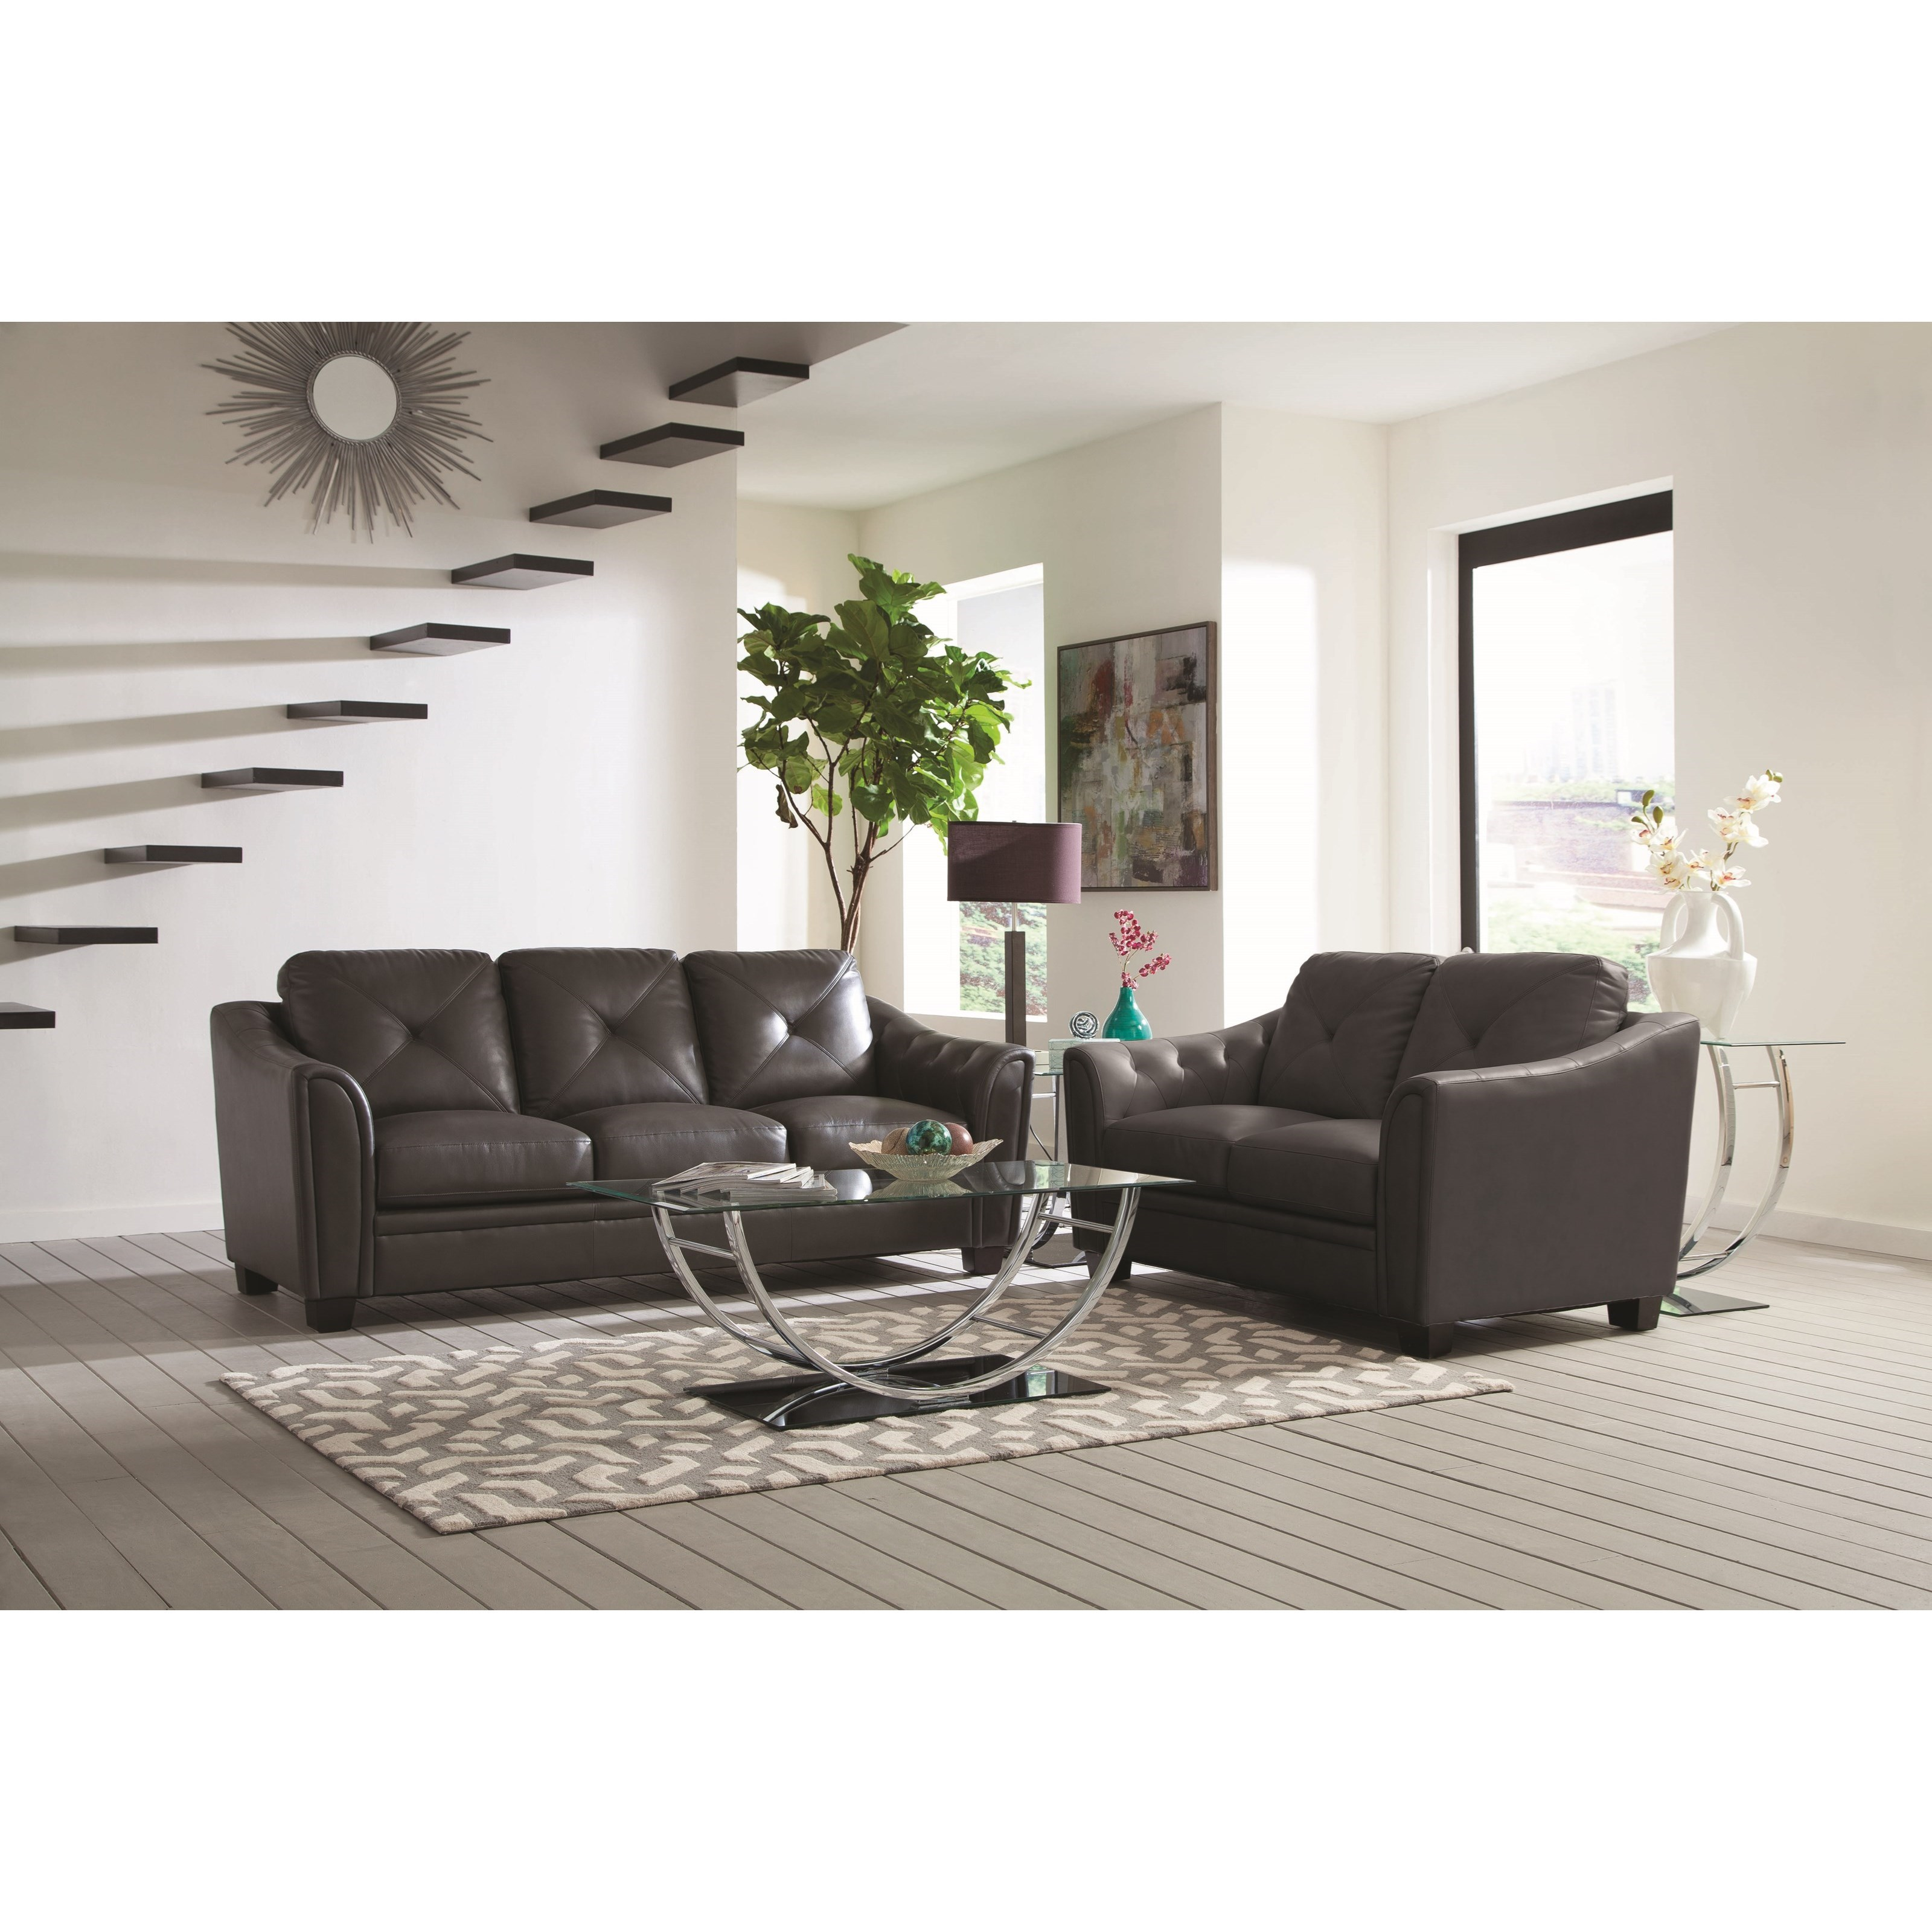 Coaster Avison Living Room Group - Item Number: 505290 Living Room Group 1